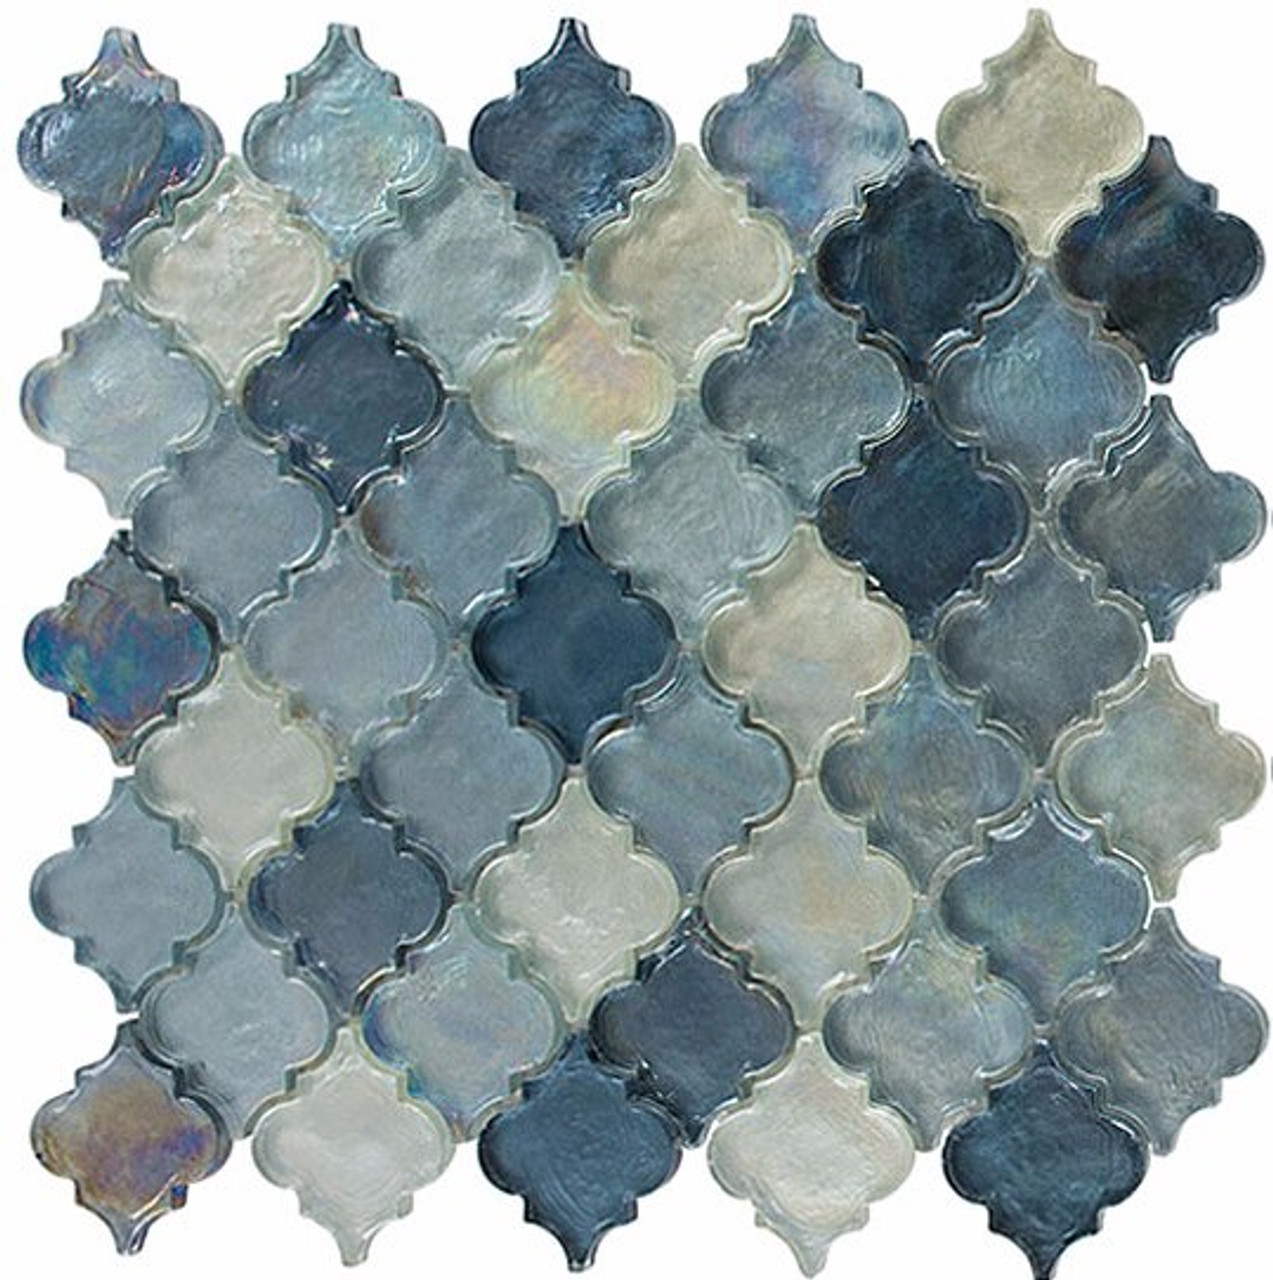 Bella Glass Tiles Dentelle Series Heavenly Lagoon Glass Mosaic